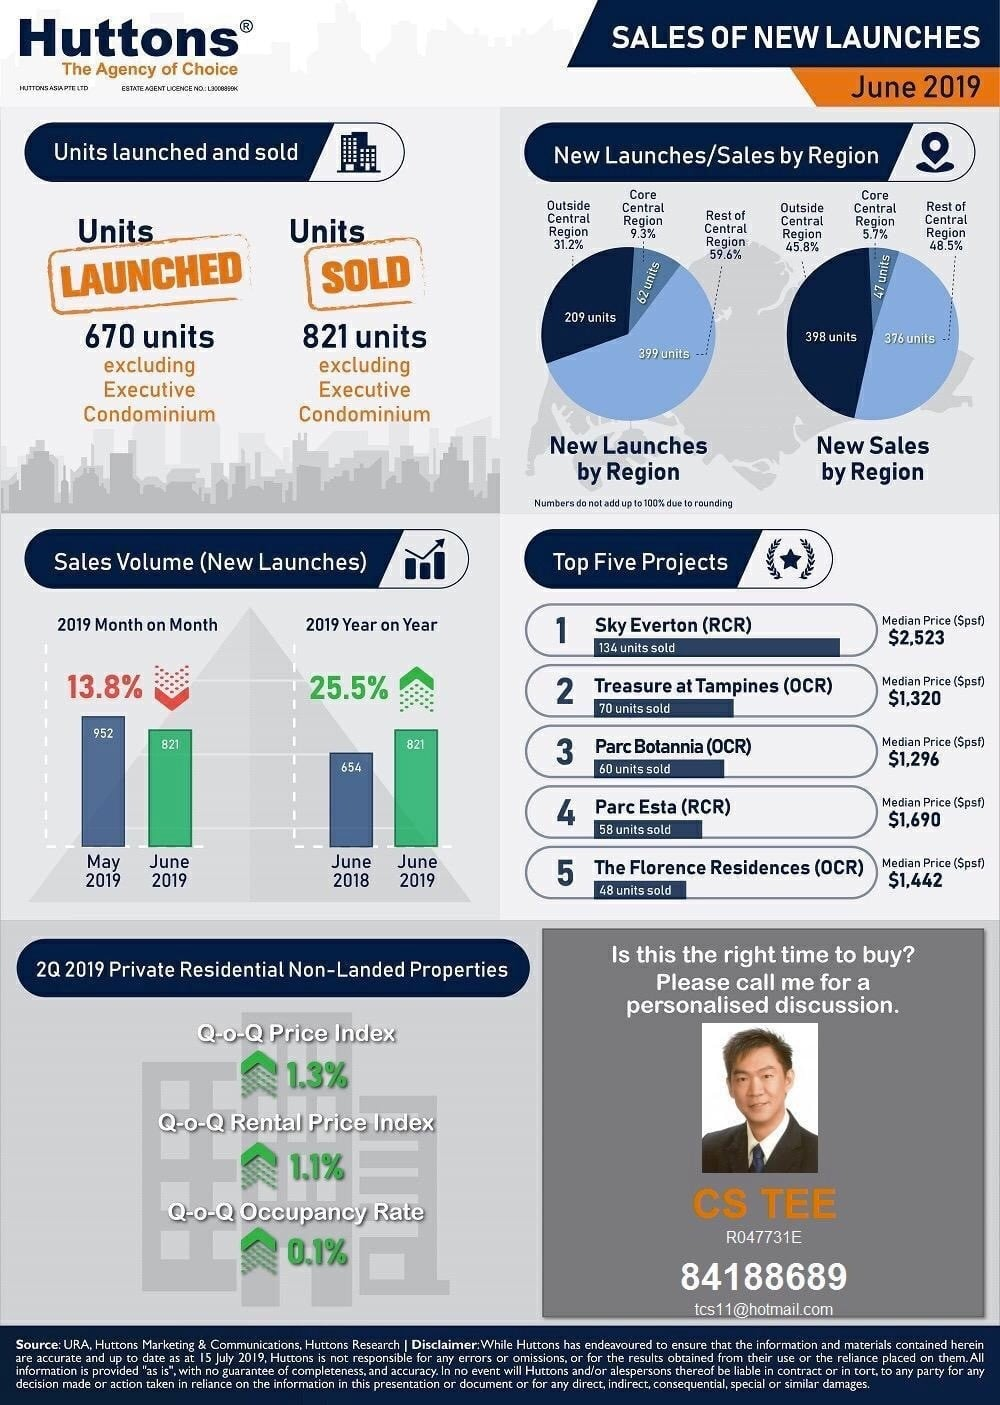 Singapore Property Market Update June 2019